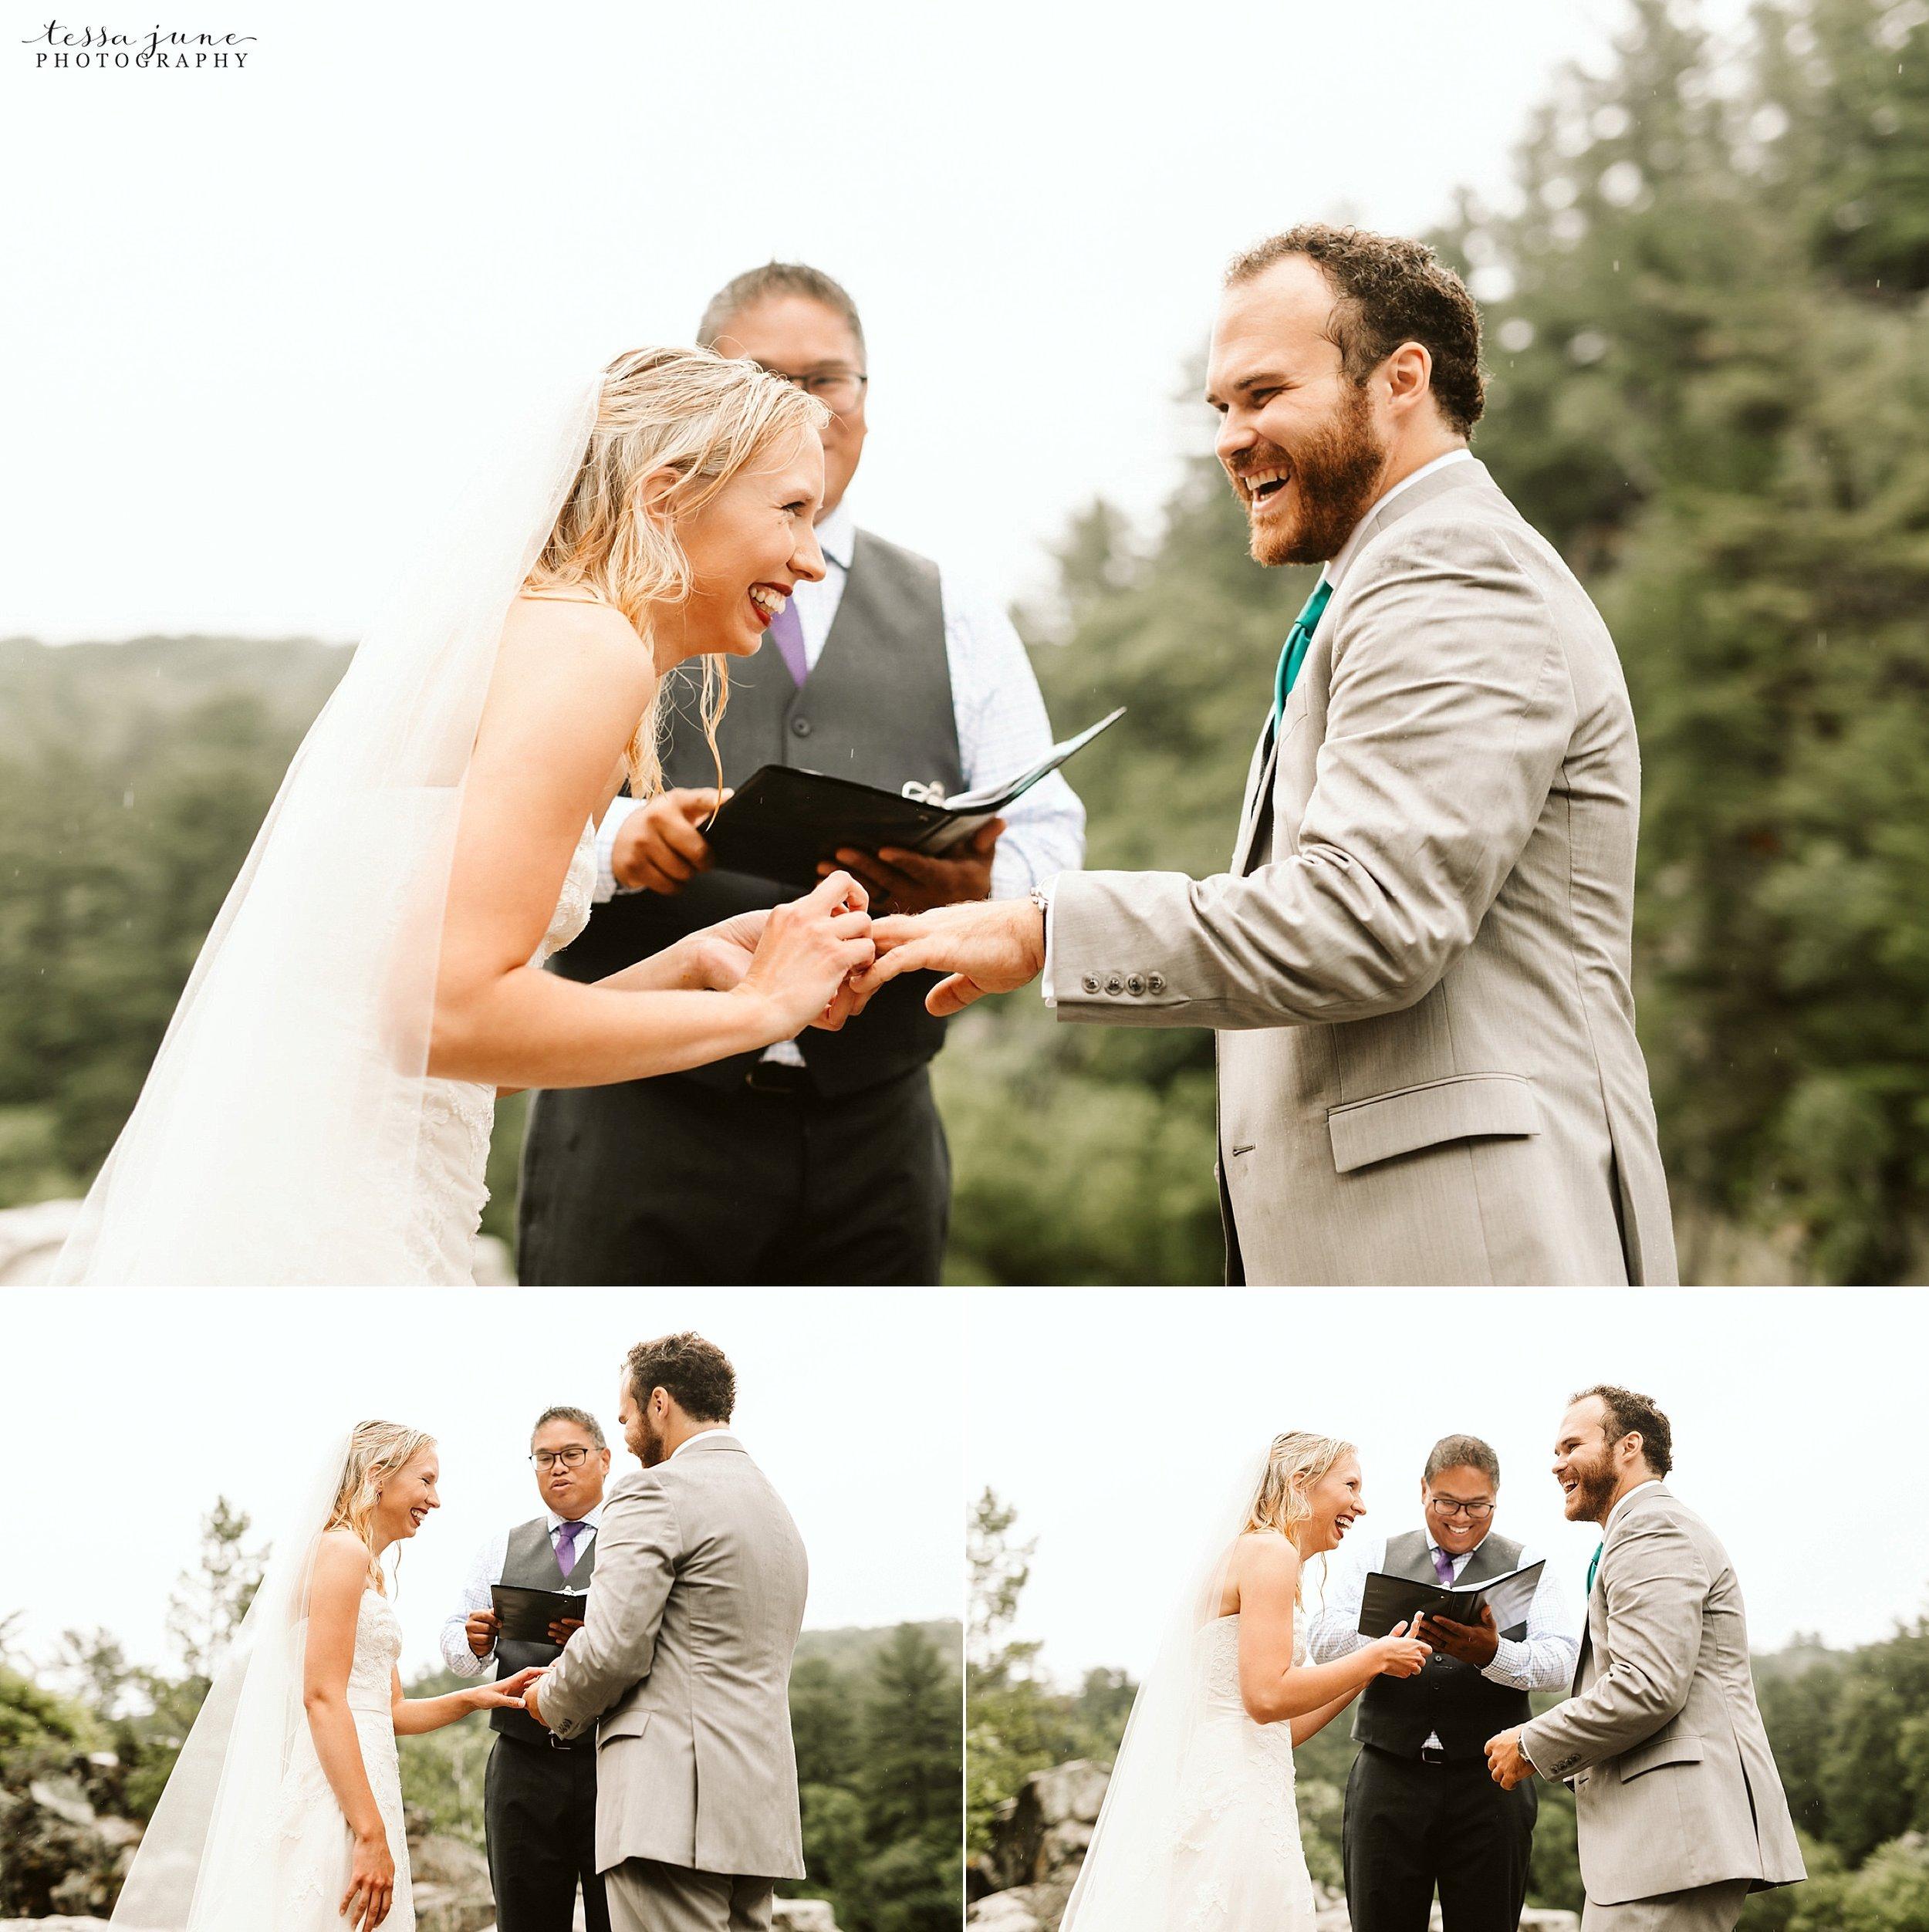 taylors-falls-rainy-elopement-wedding-interstate-state-park-60.jpg